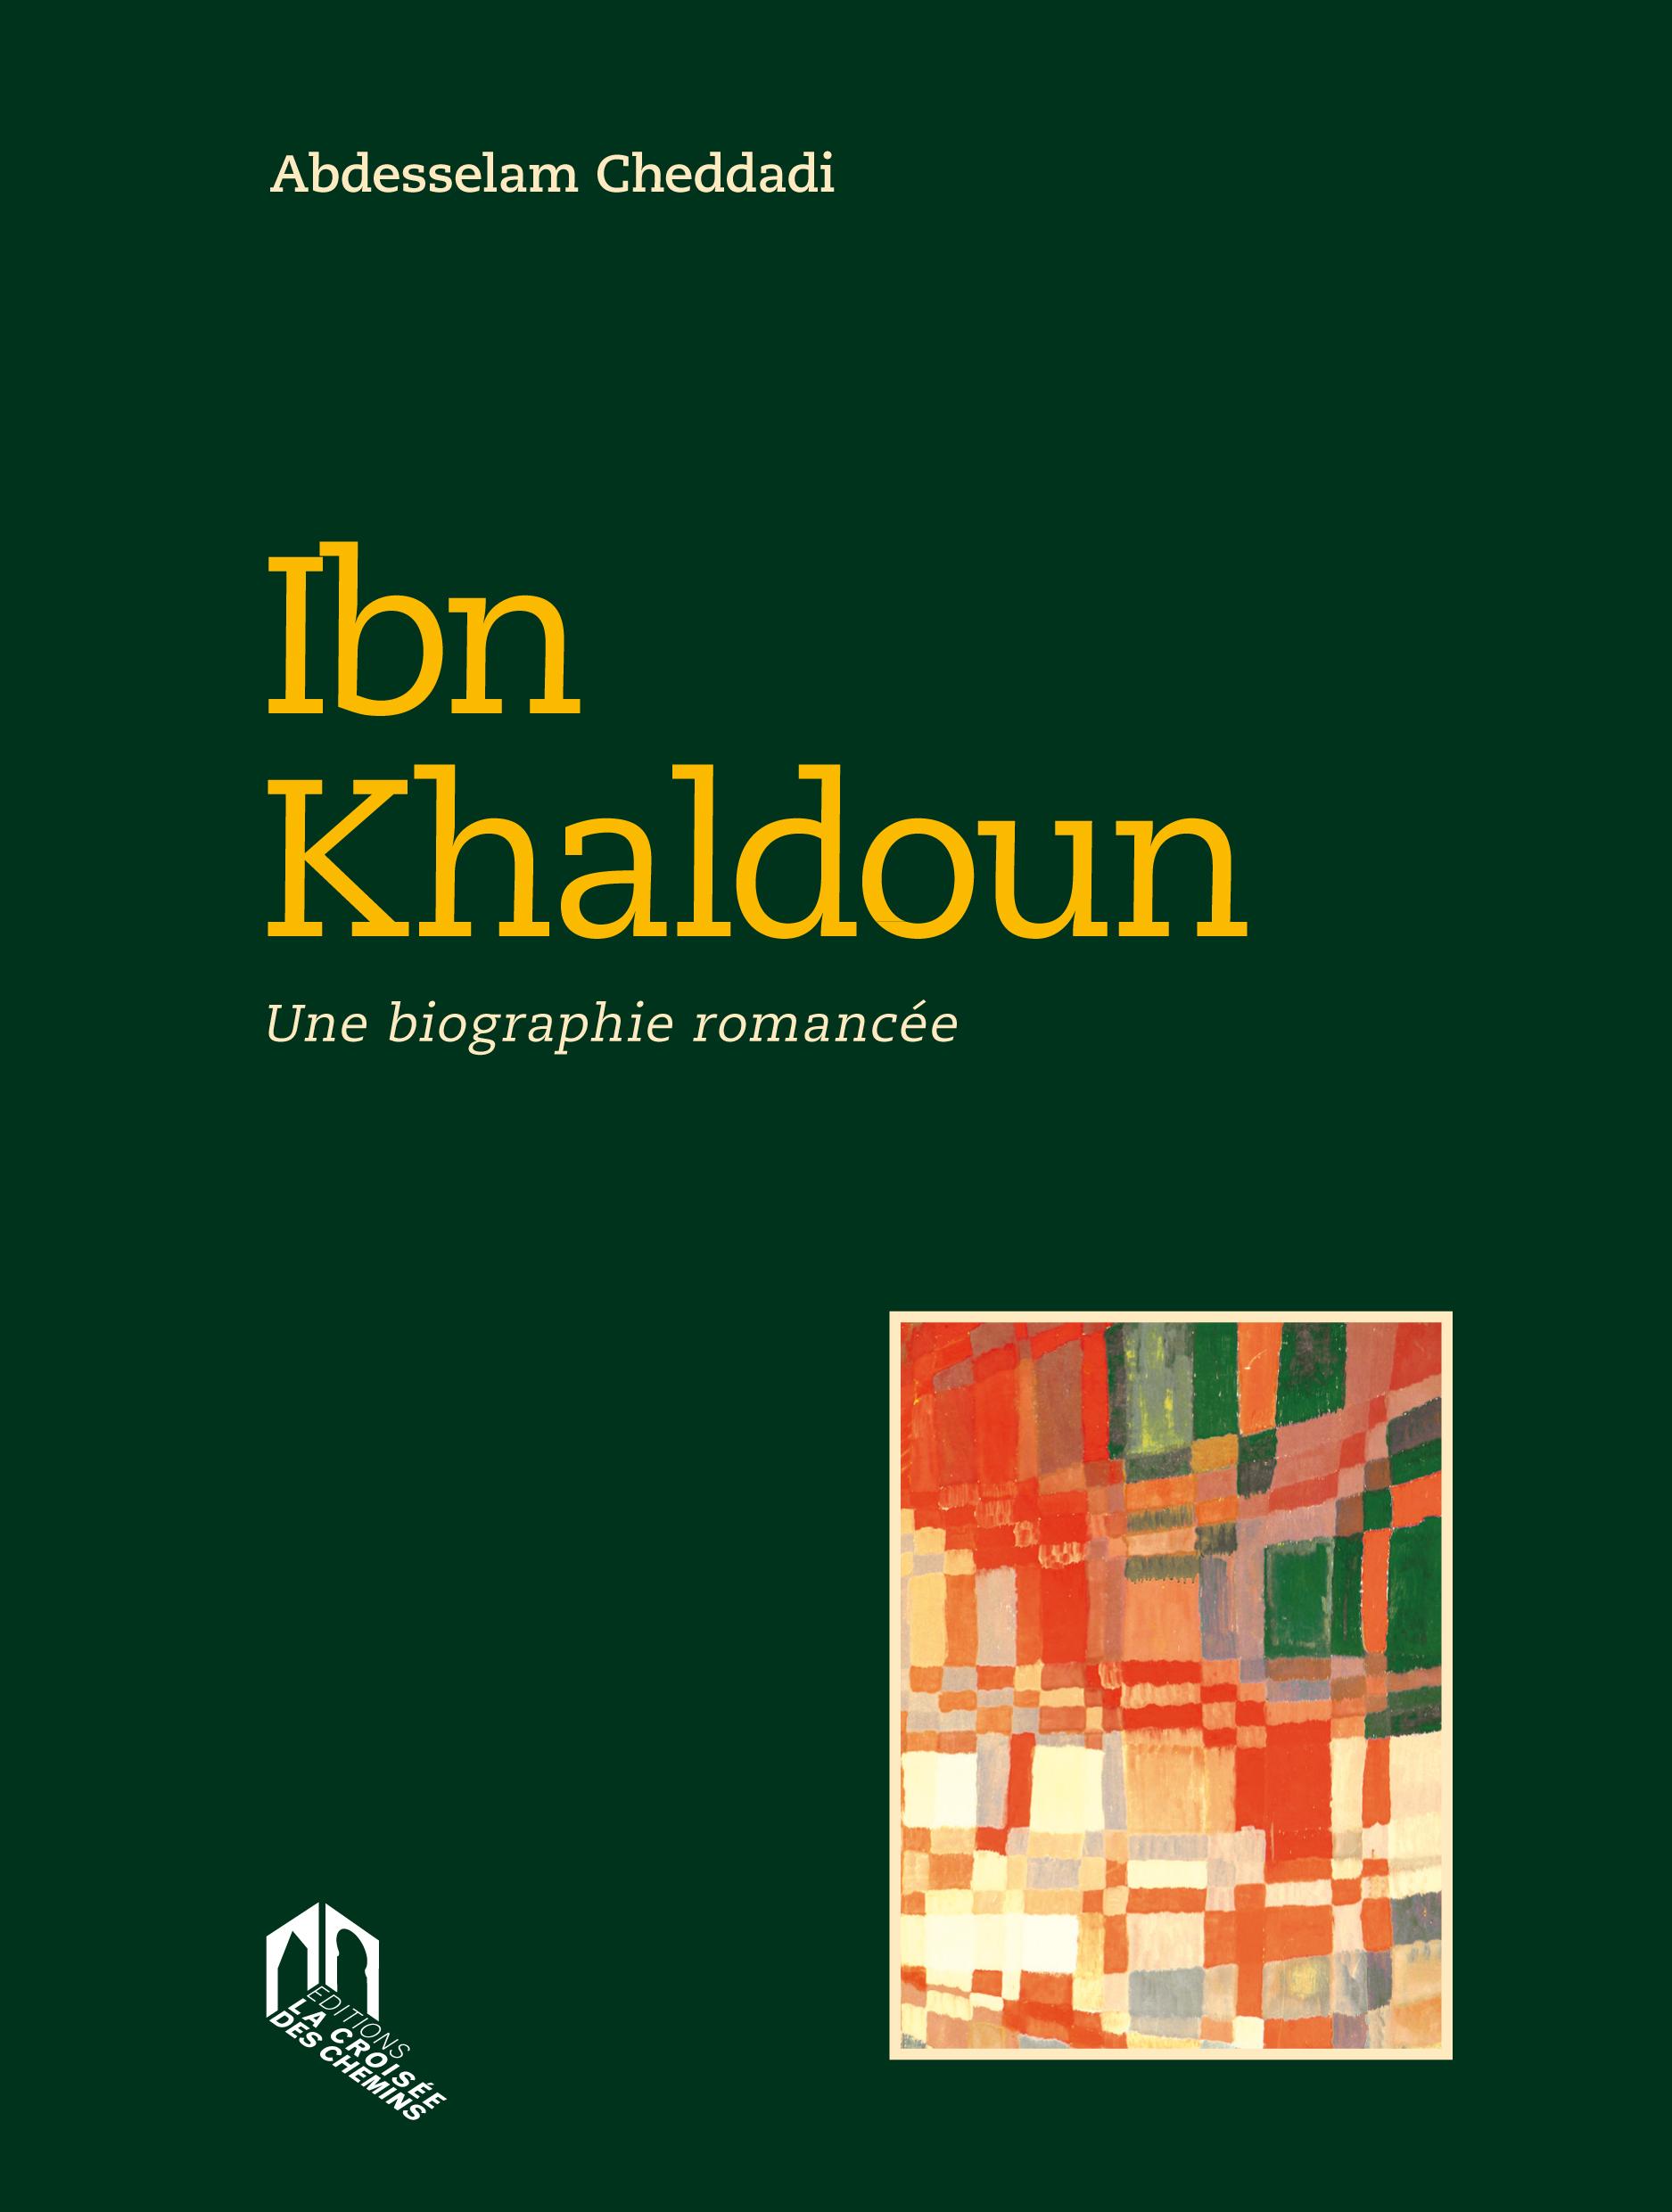 IBN KHALDOUN, UNE BIOGRAPHIE ROMANCEE